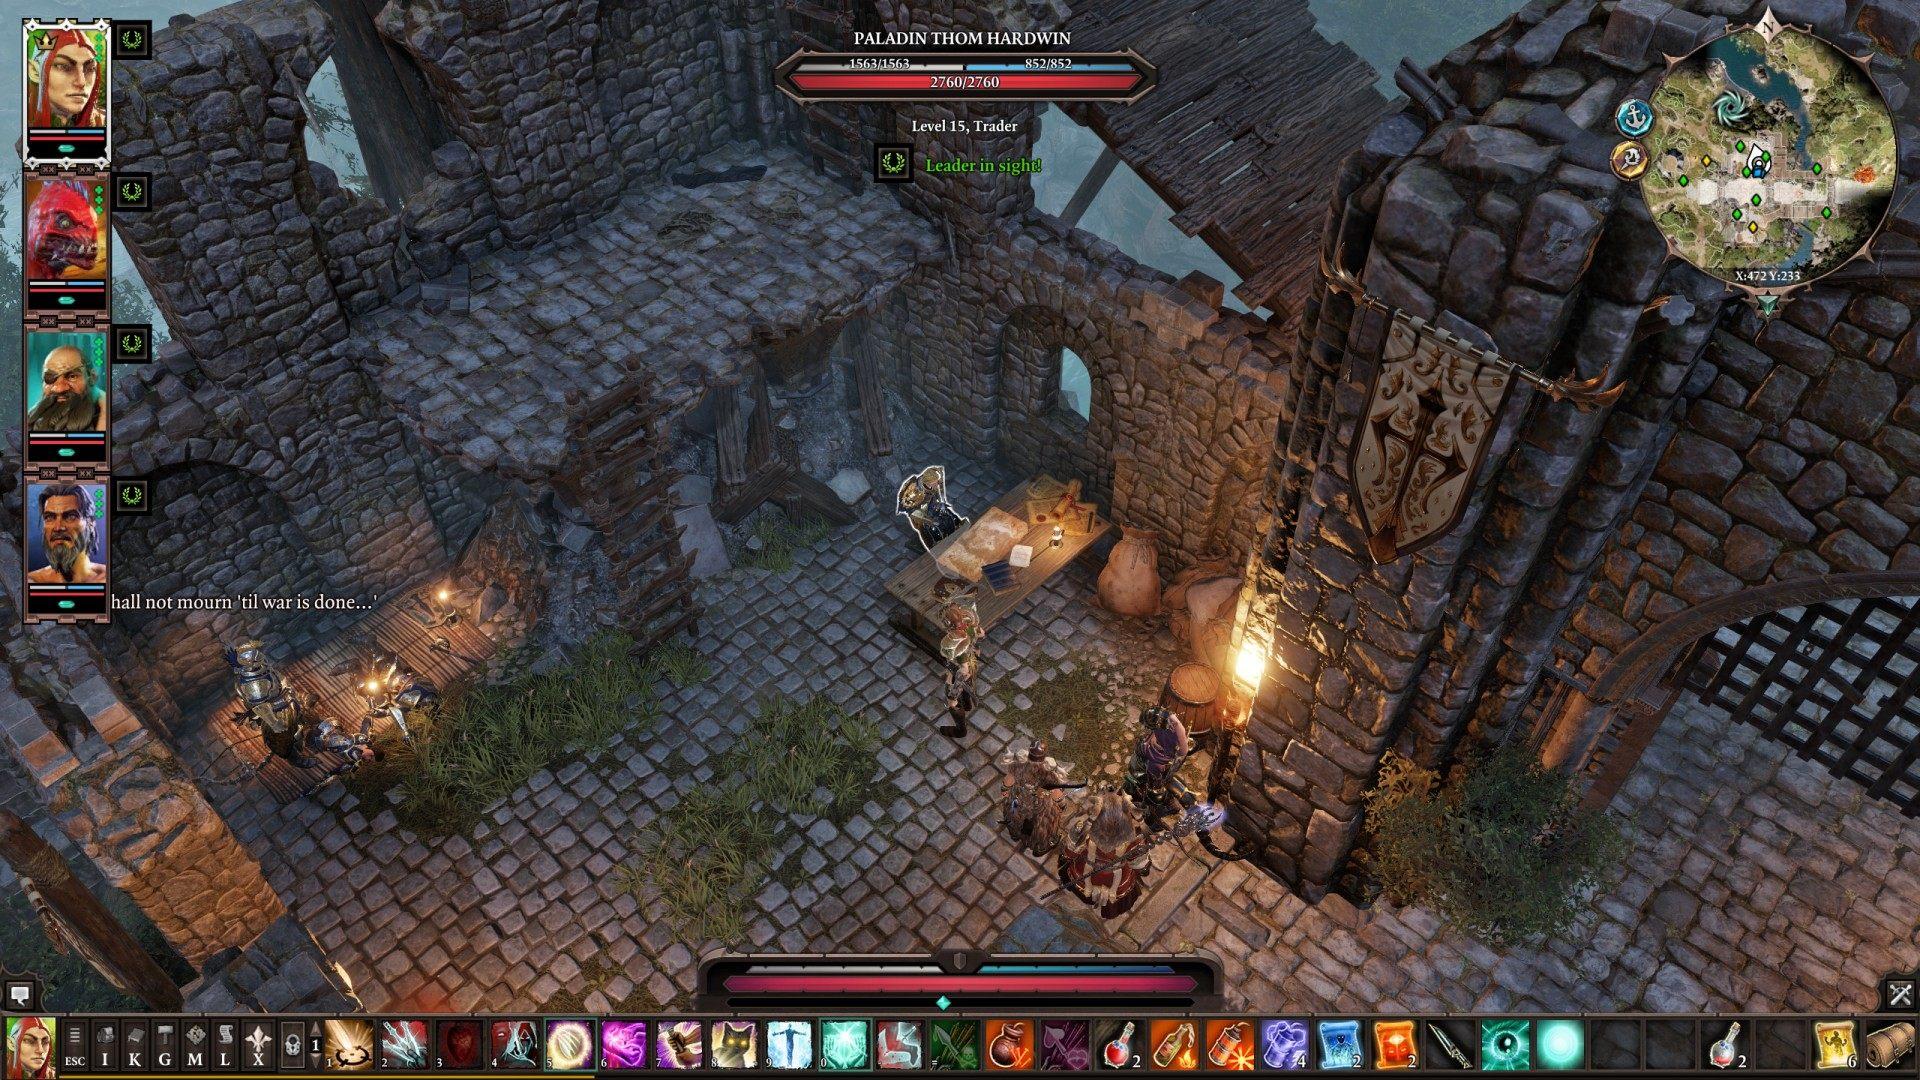 Dark Dealings in the Blackpits, Divinity: Original Sin 2 Quest